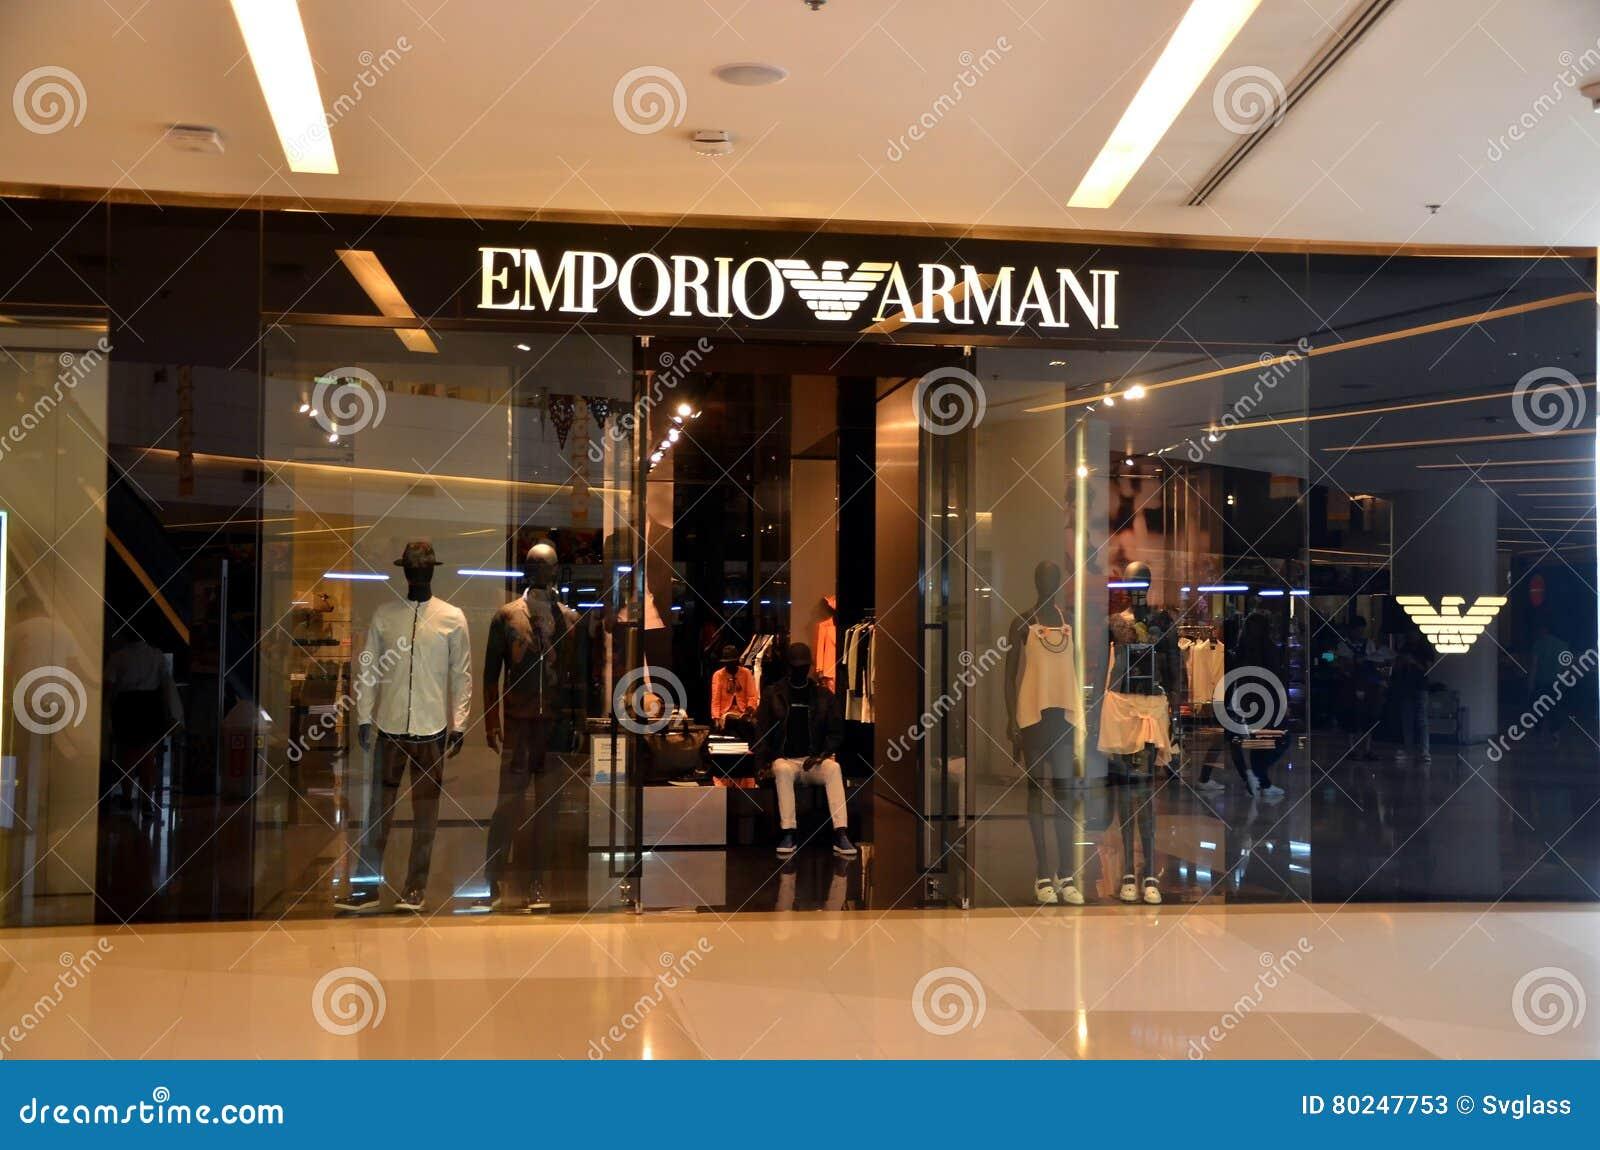 43a7cee9ea534 Loja de Emporio Armani foto de stock editorial. Imagem de armani ...